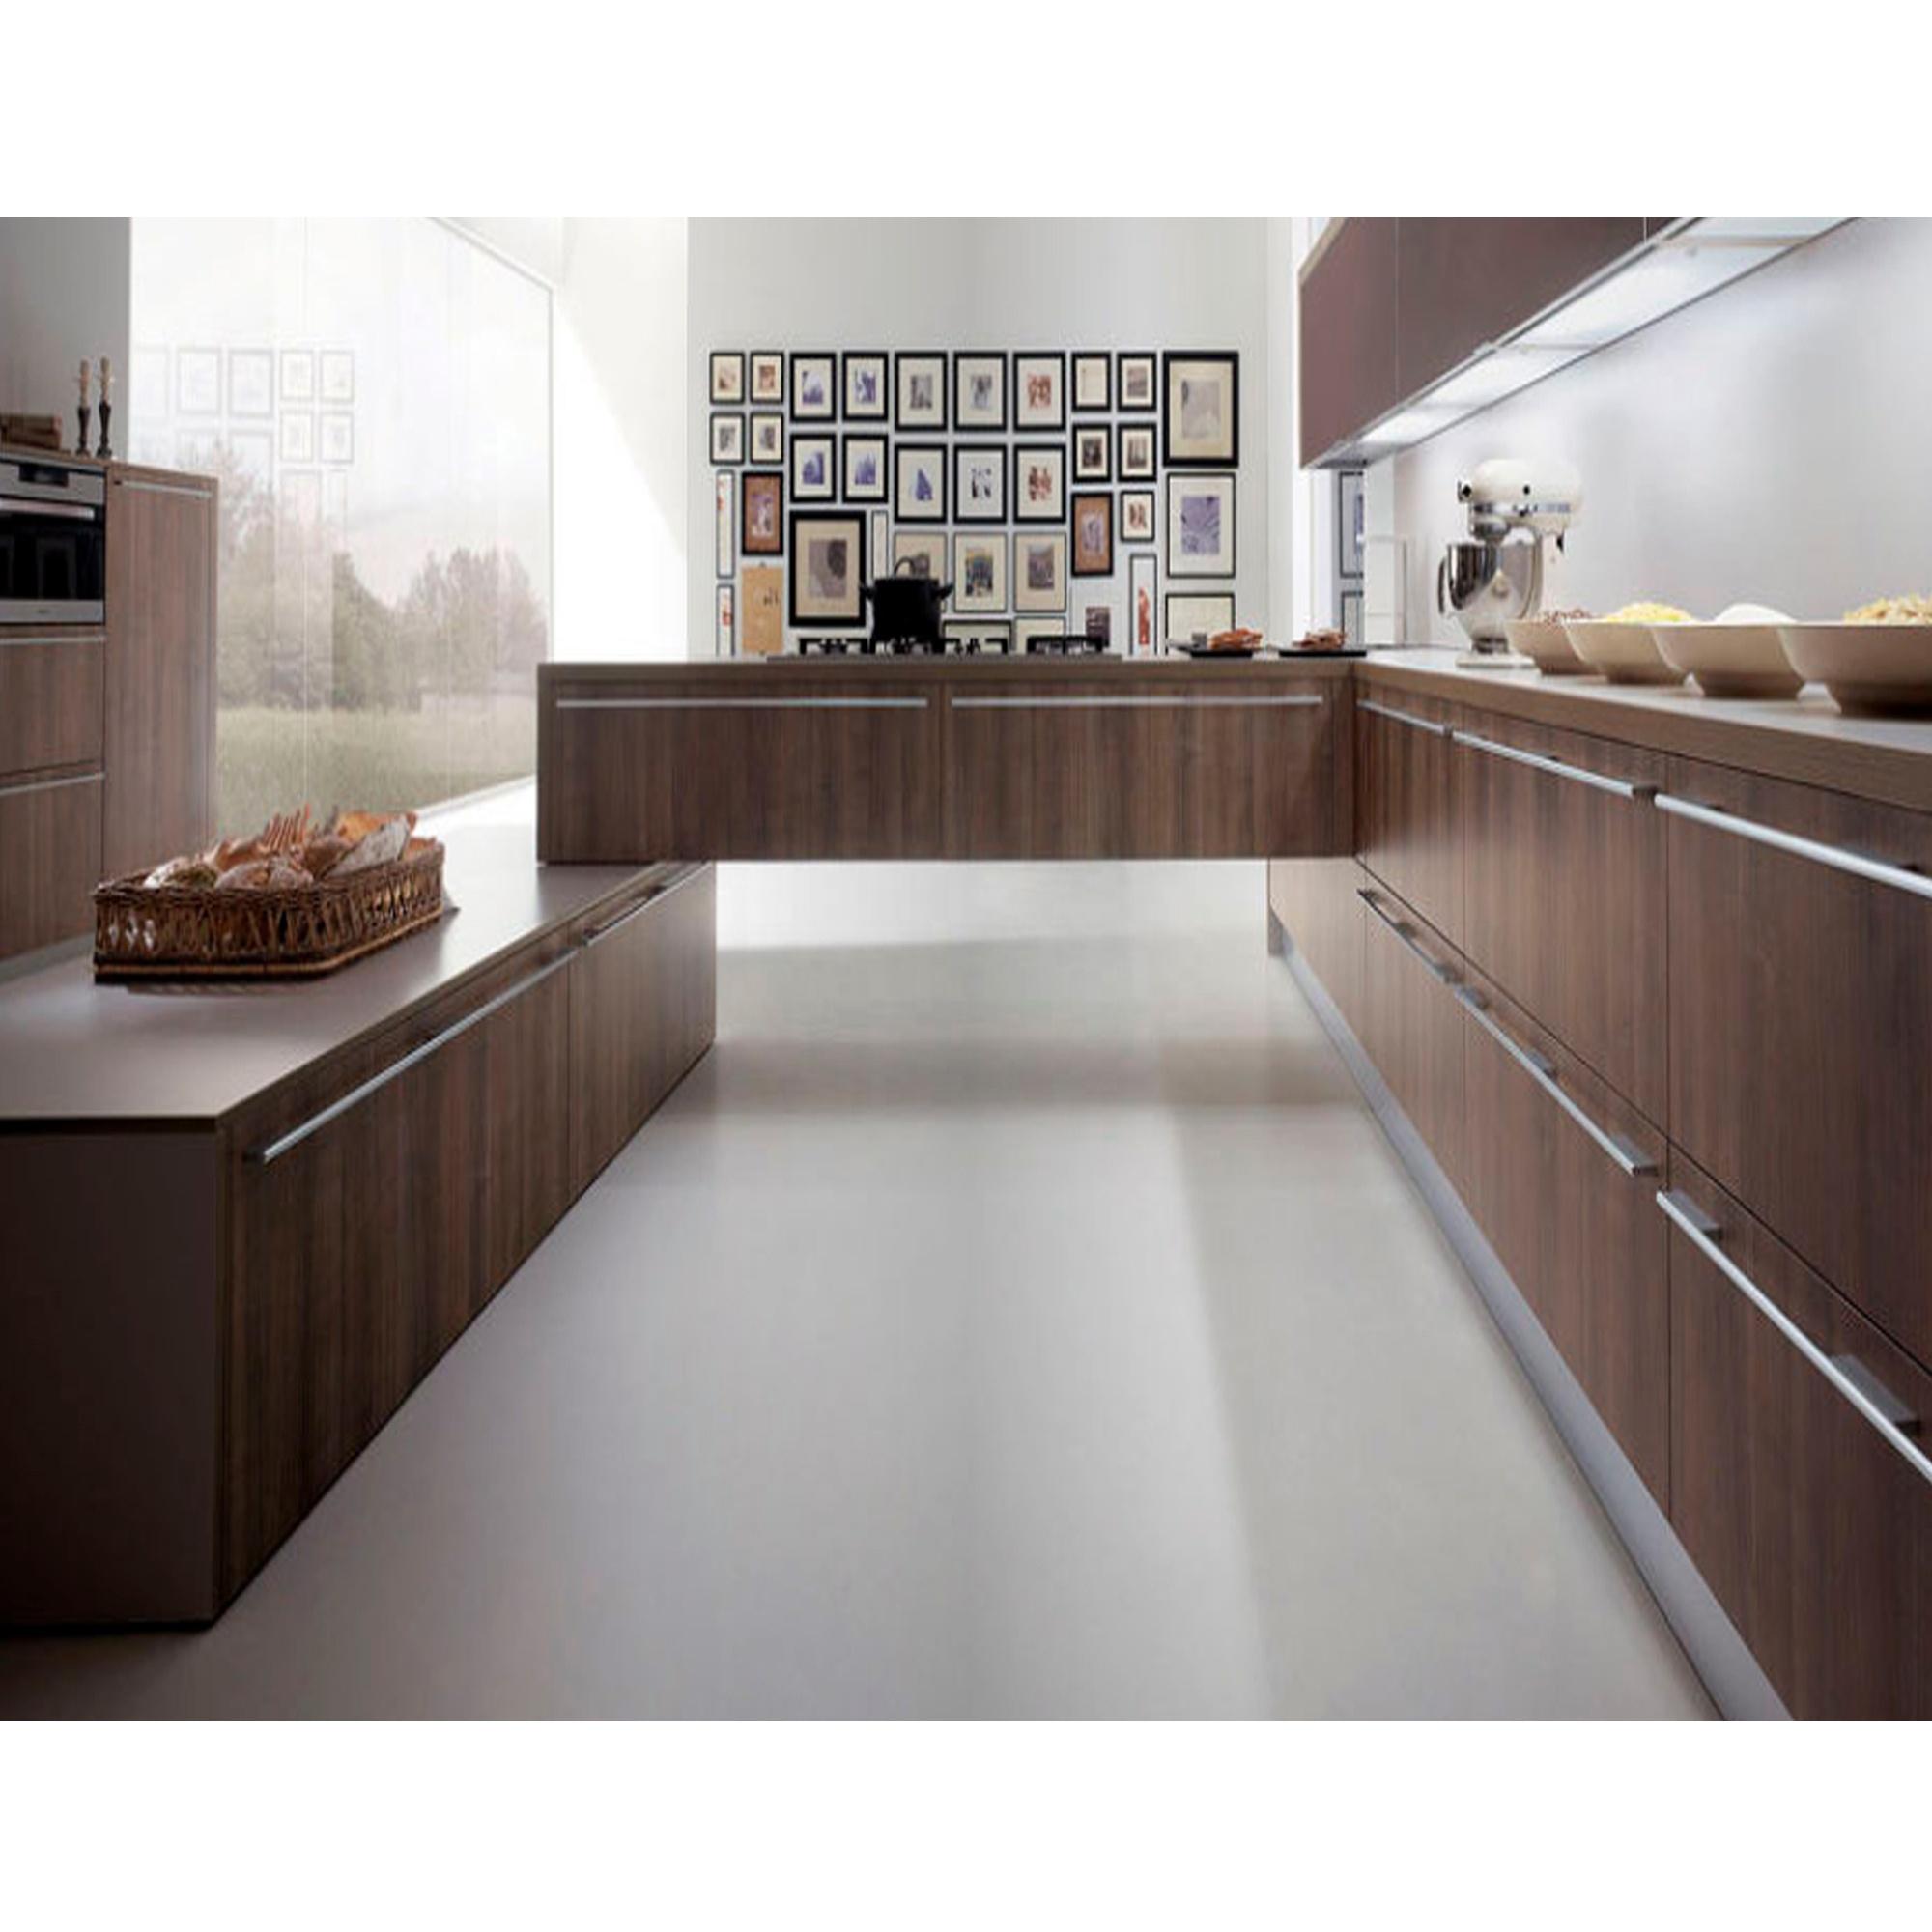 Nicocabinet High Quality Luxury Modular Solid Wood Kitchen Cabinet ...